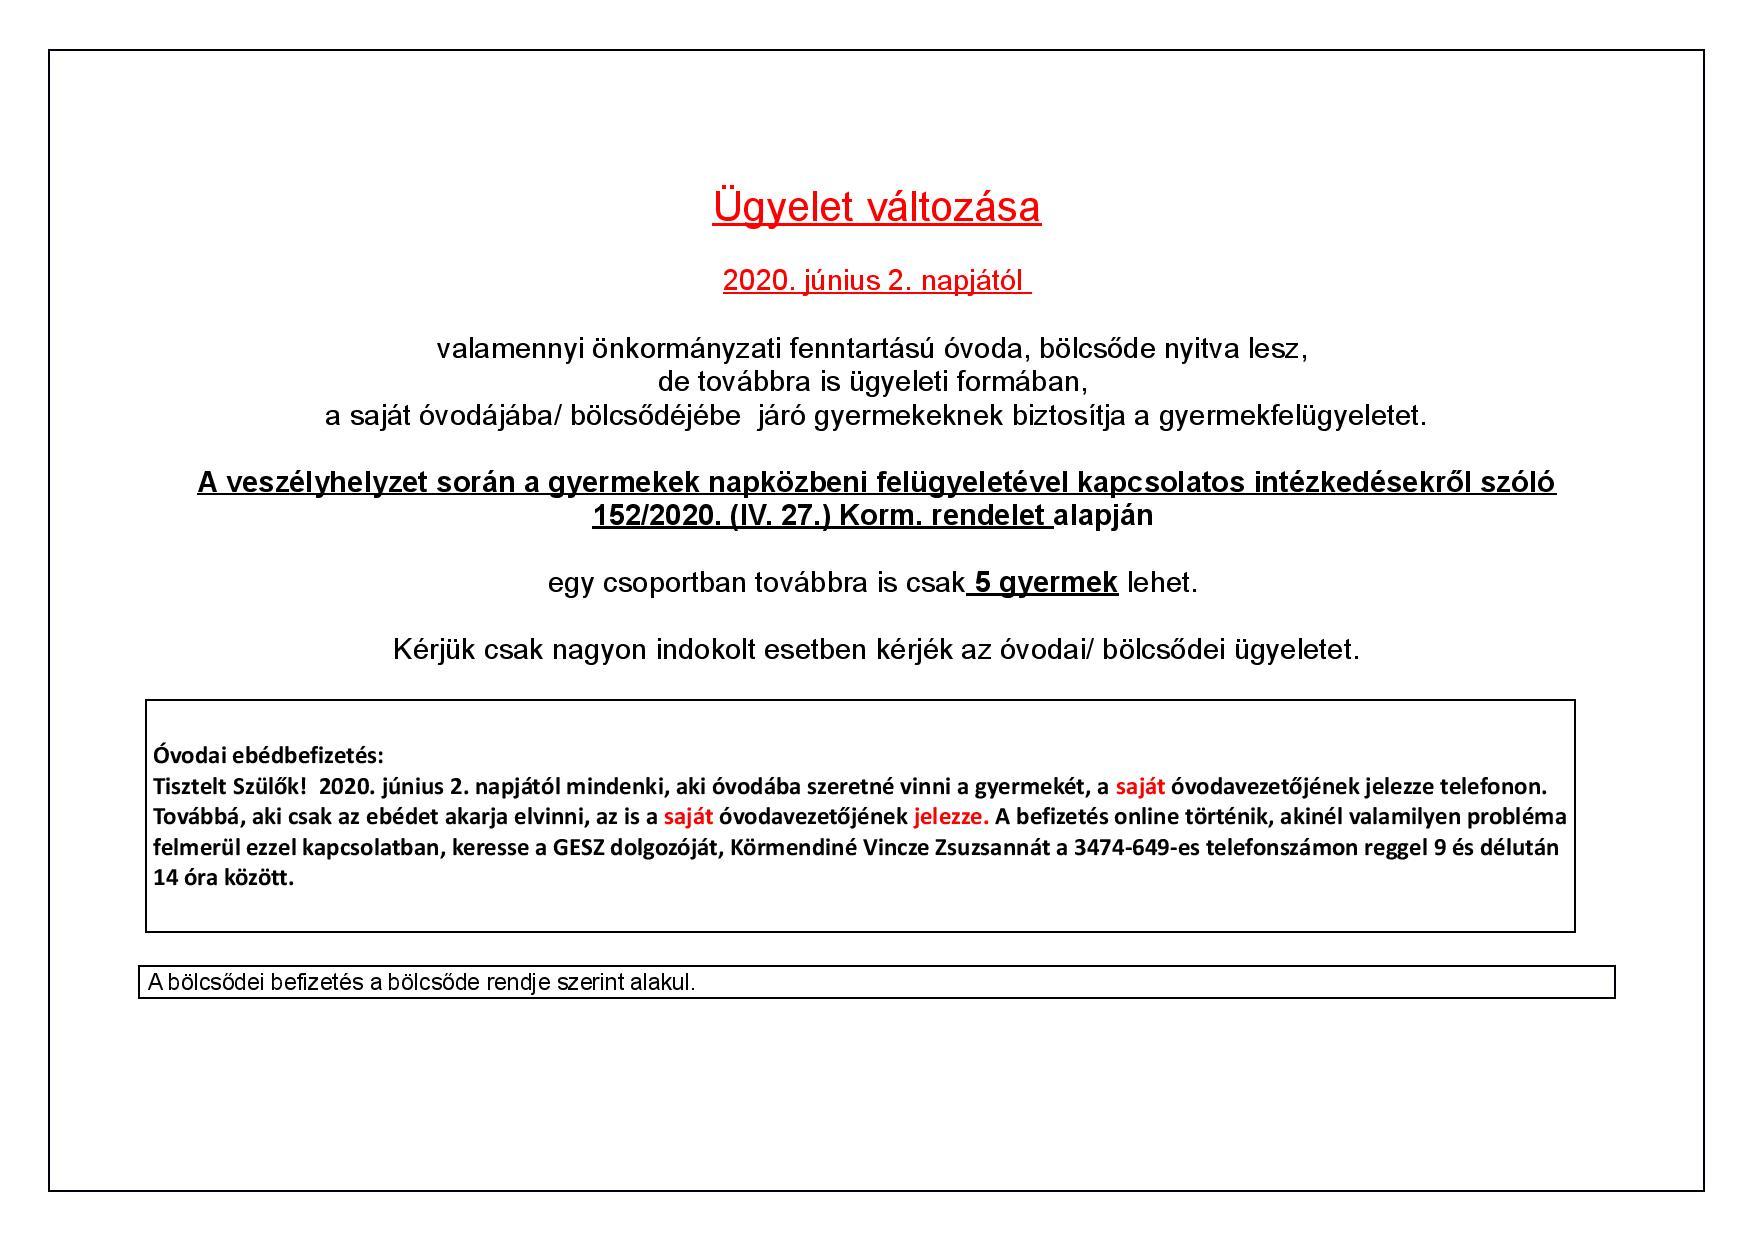 valtozas-ovodai-bolcsodei-ugyelet202005-06-02